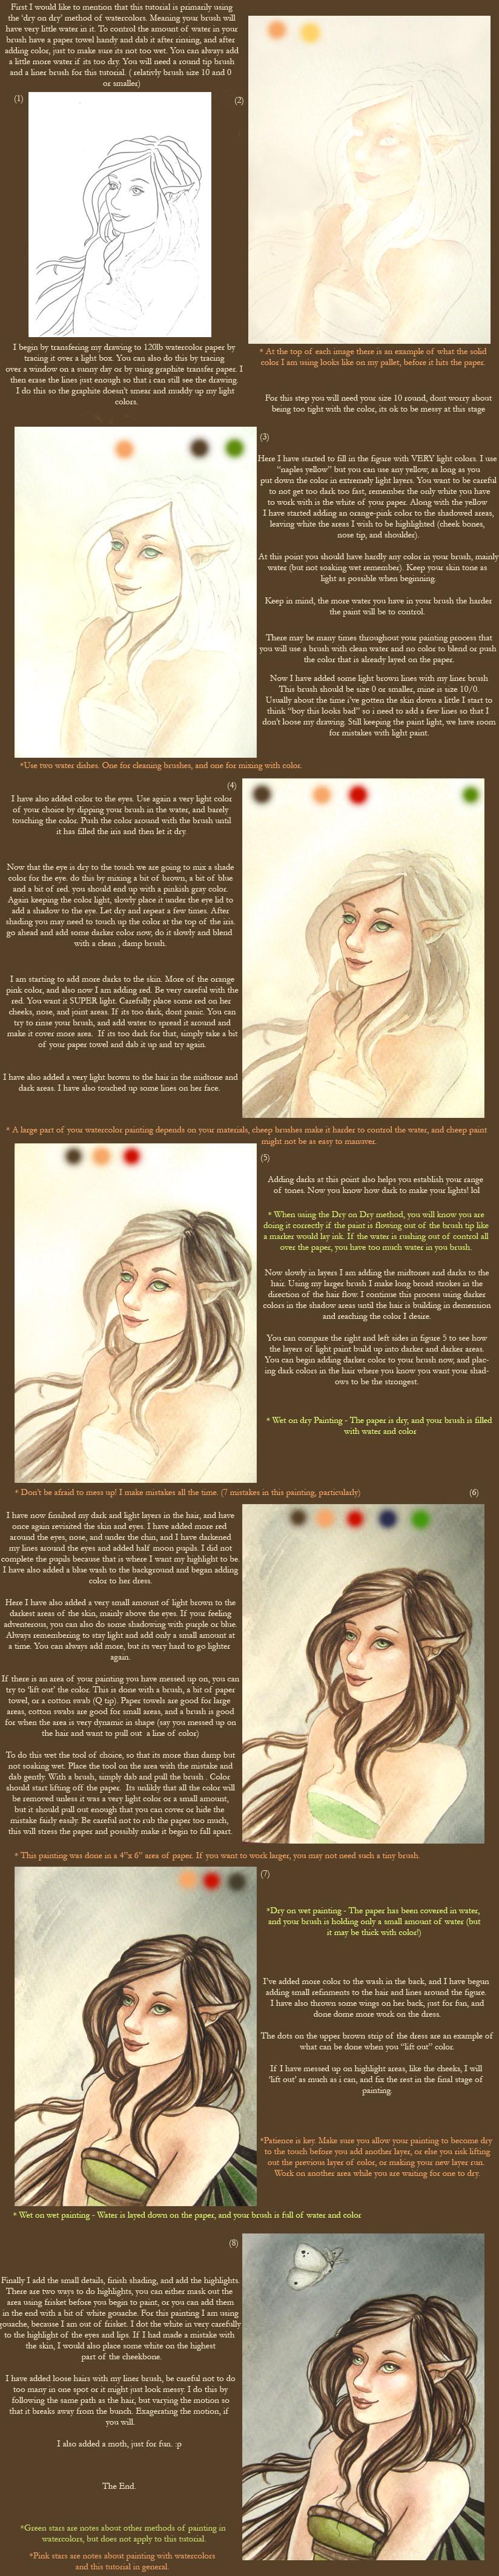 Basic Watercolor Tutorial by LiquidFaeStudios